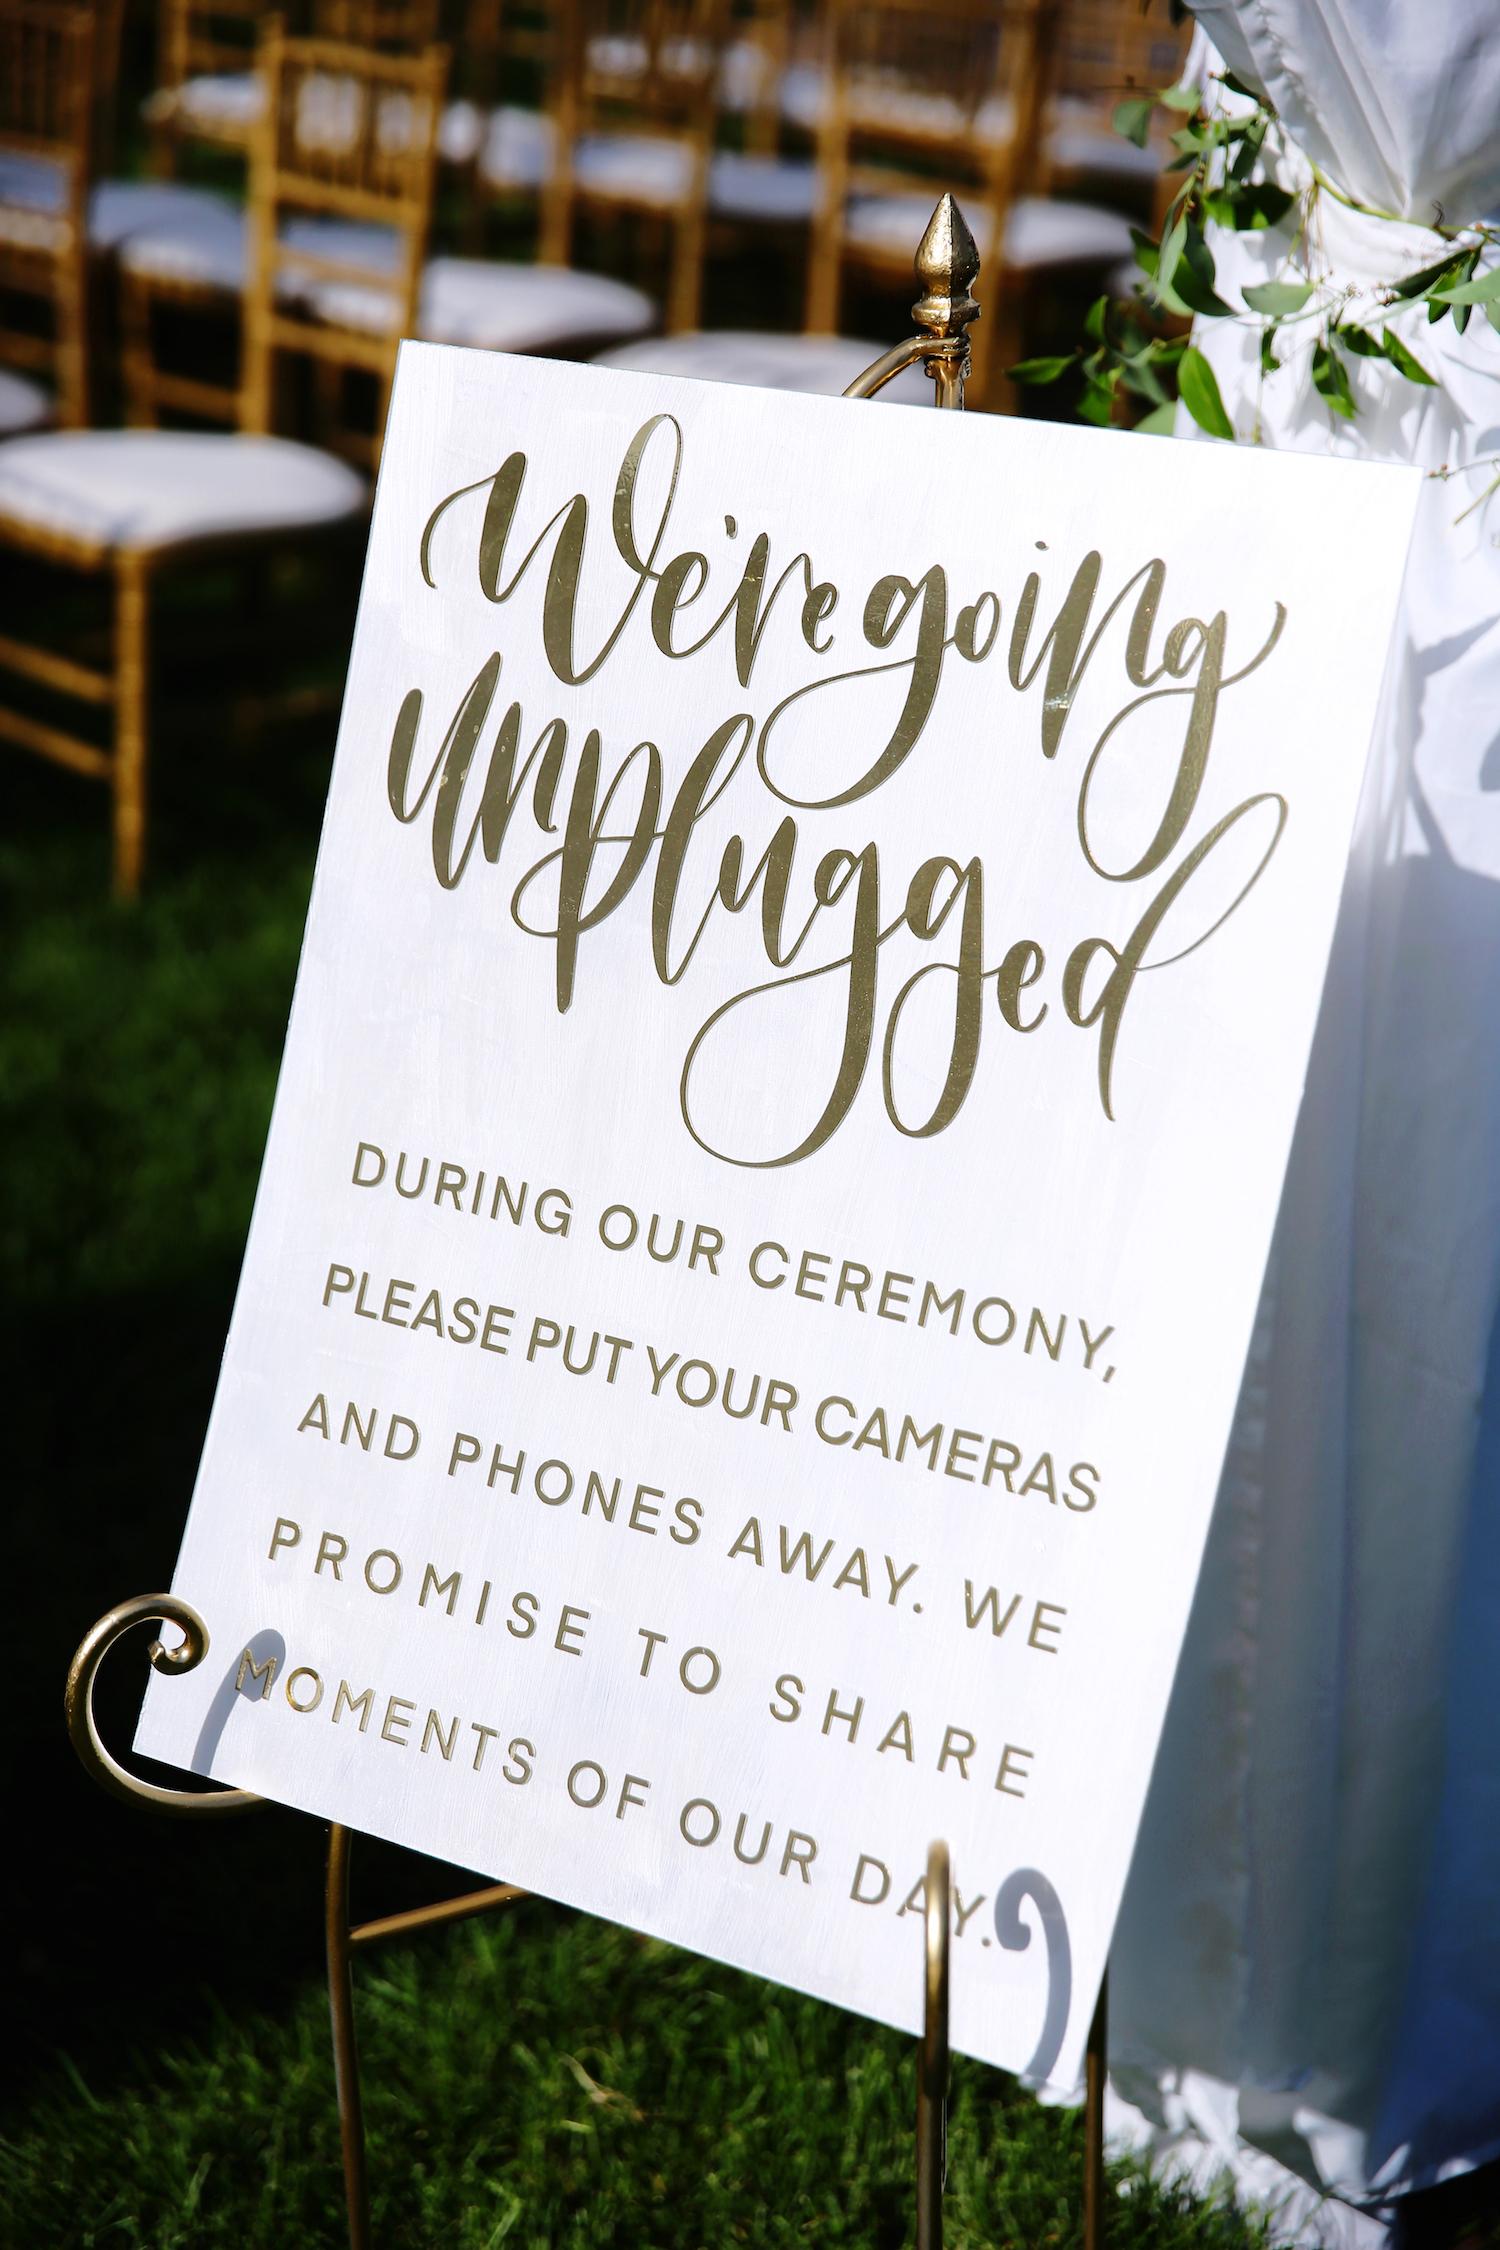 Unplugged wedding sign at kalamazoo Michigan wedding